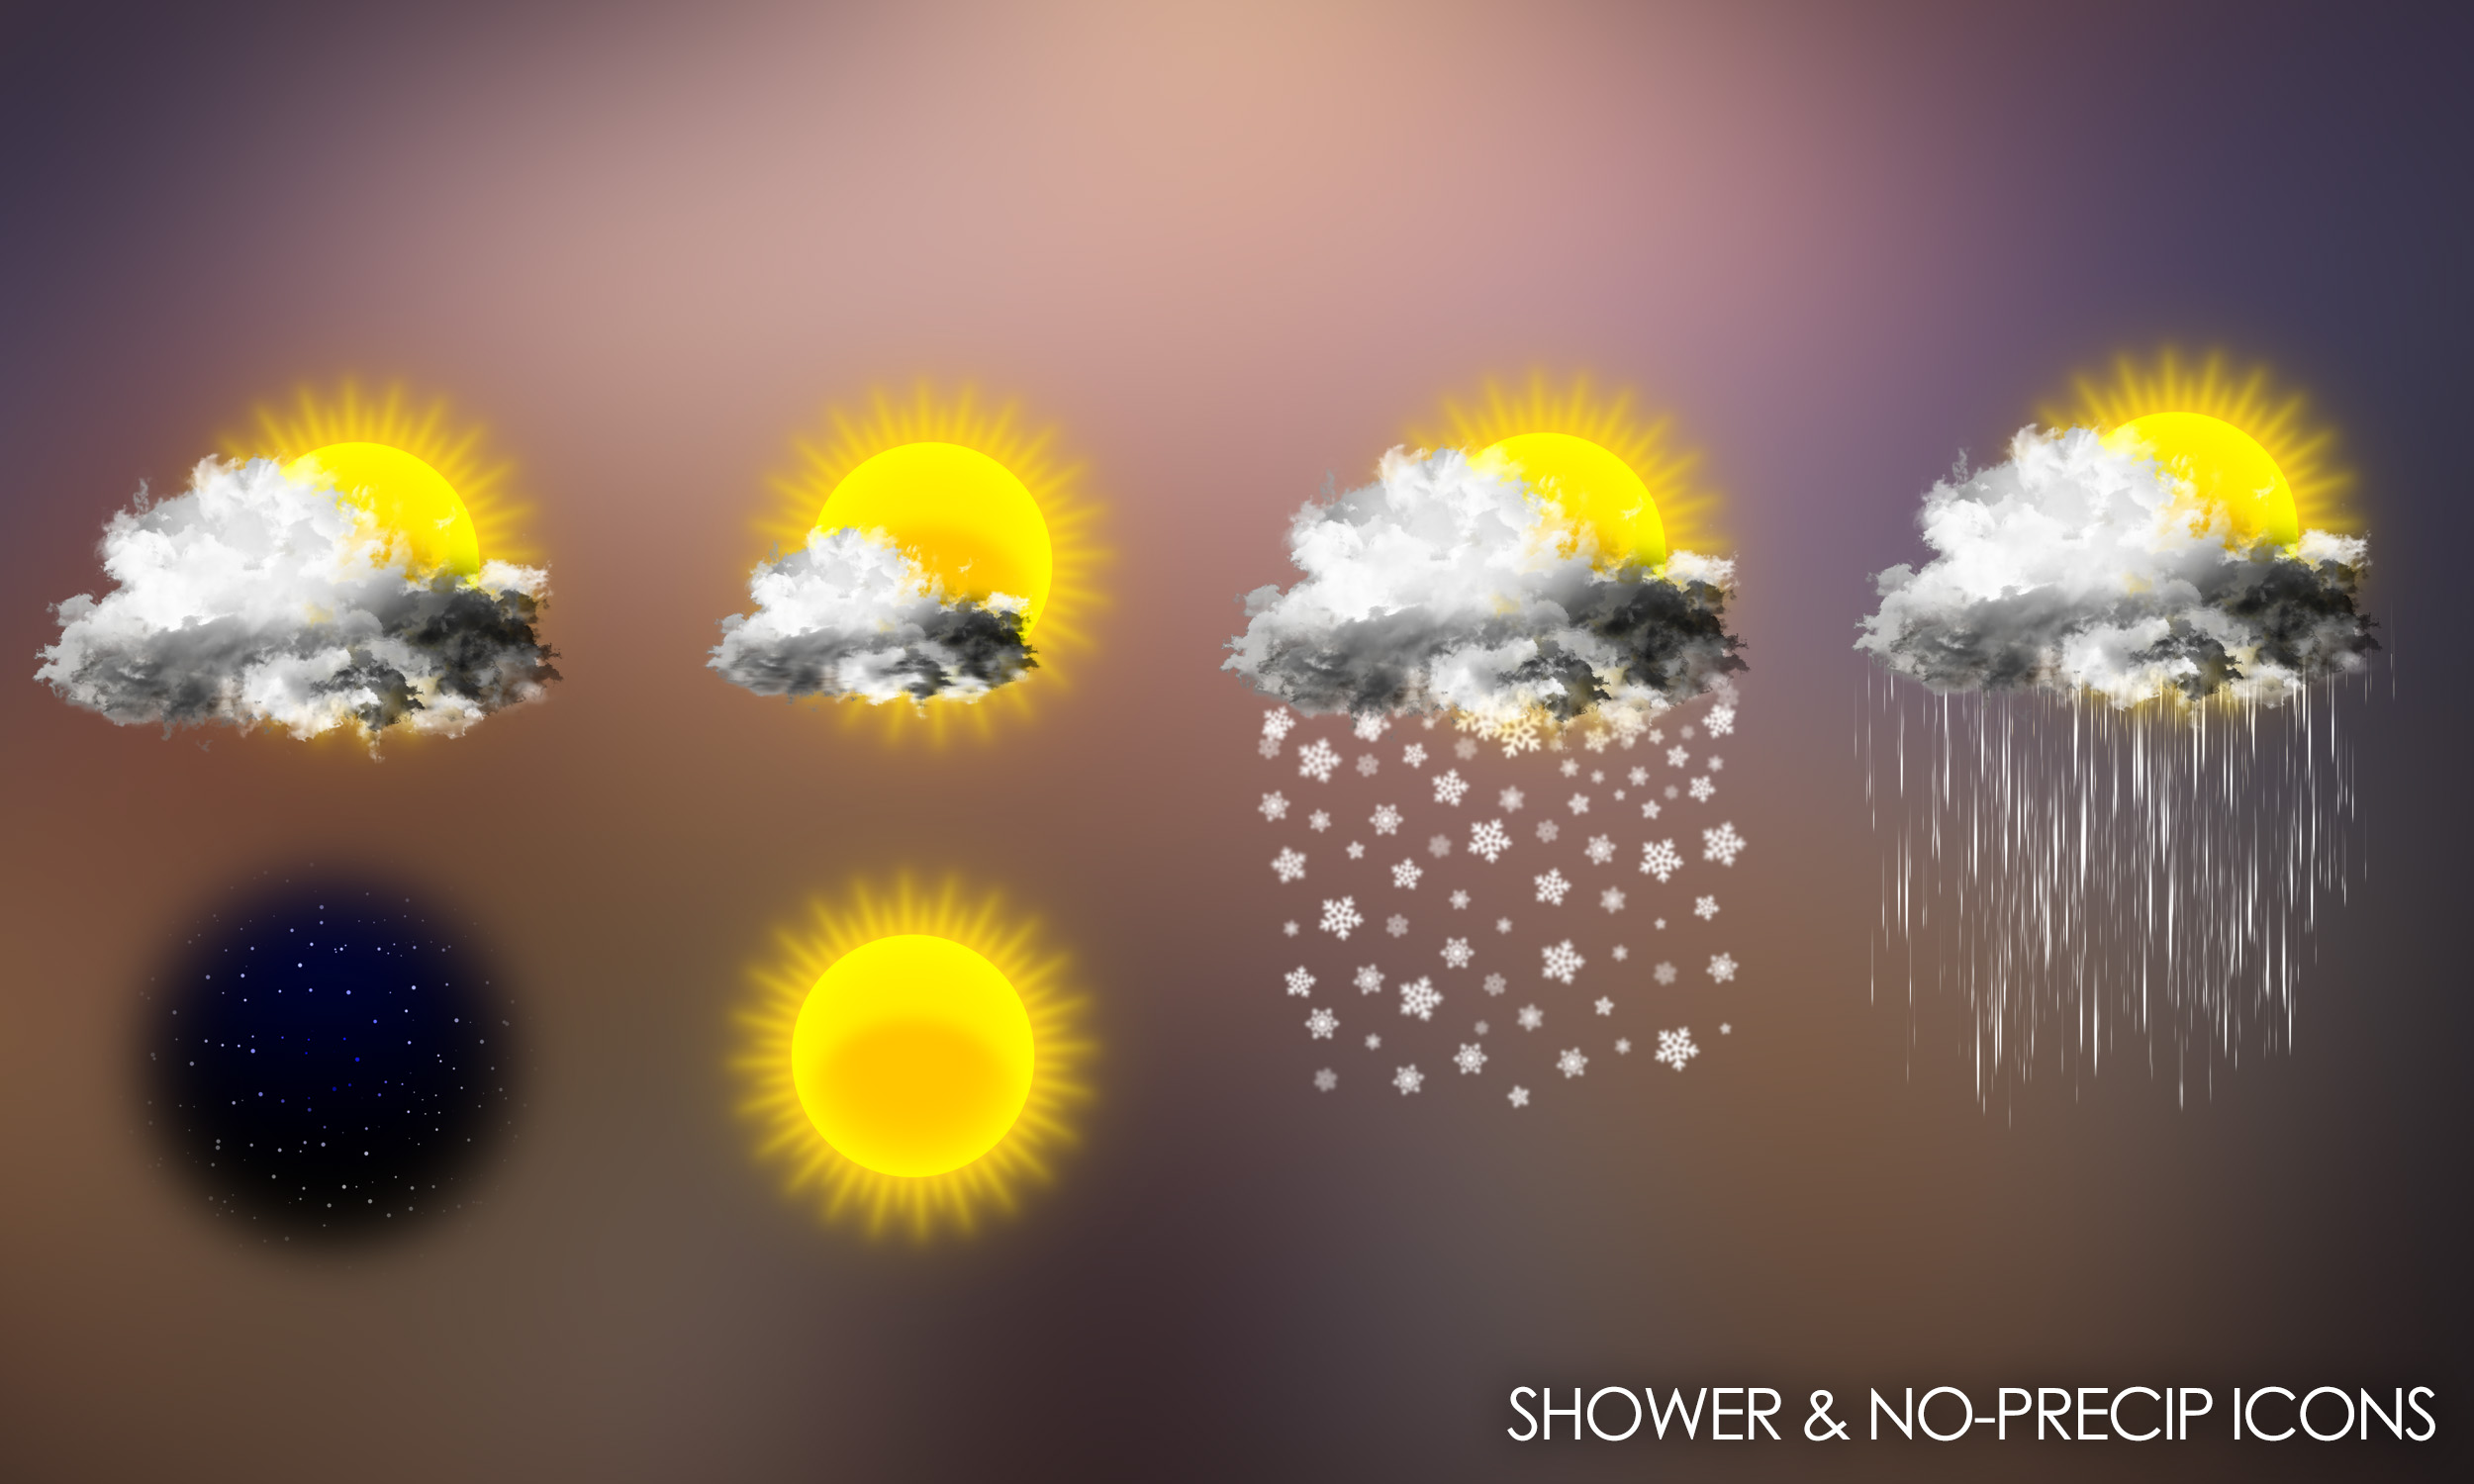 Shower + No Pcp